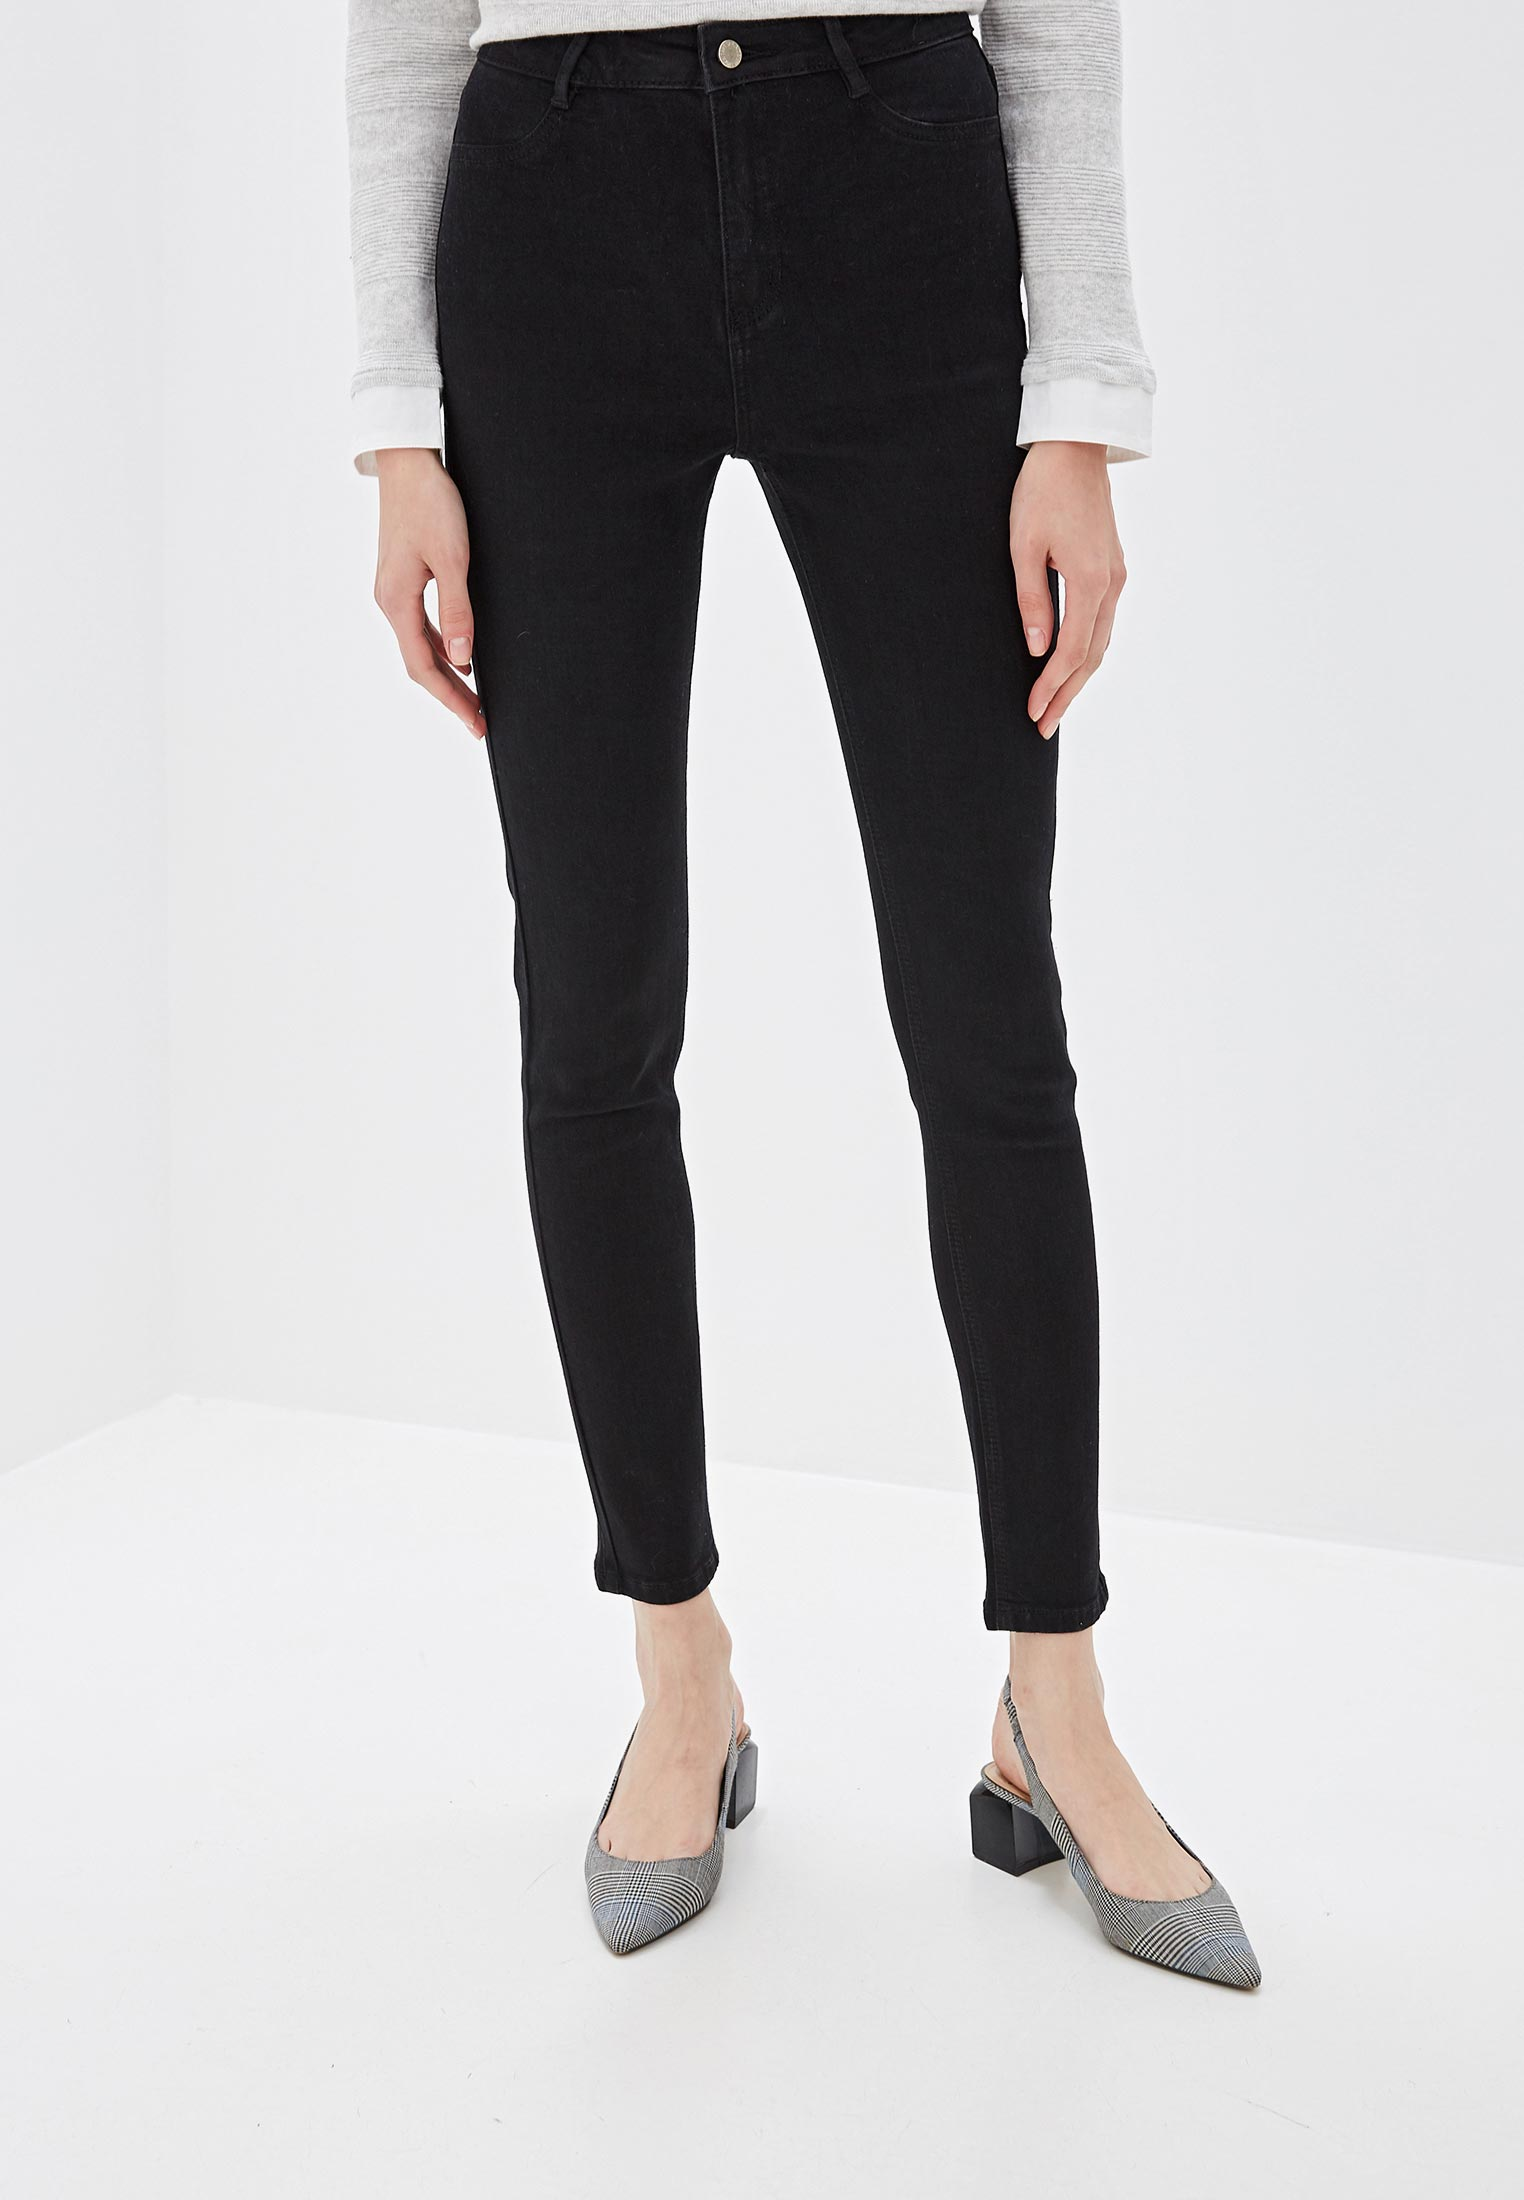 Зауженные джинсы Sela (Сэла) PJ-135/697-9391